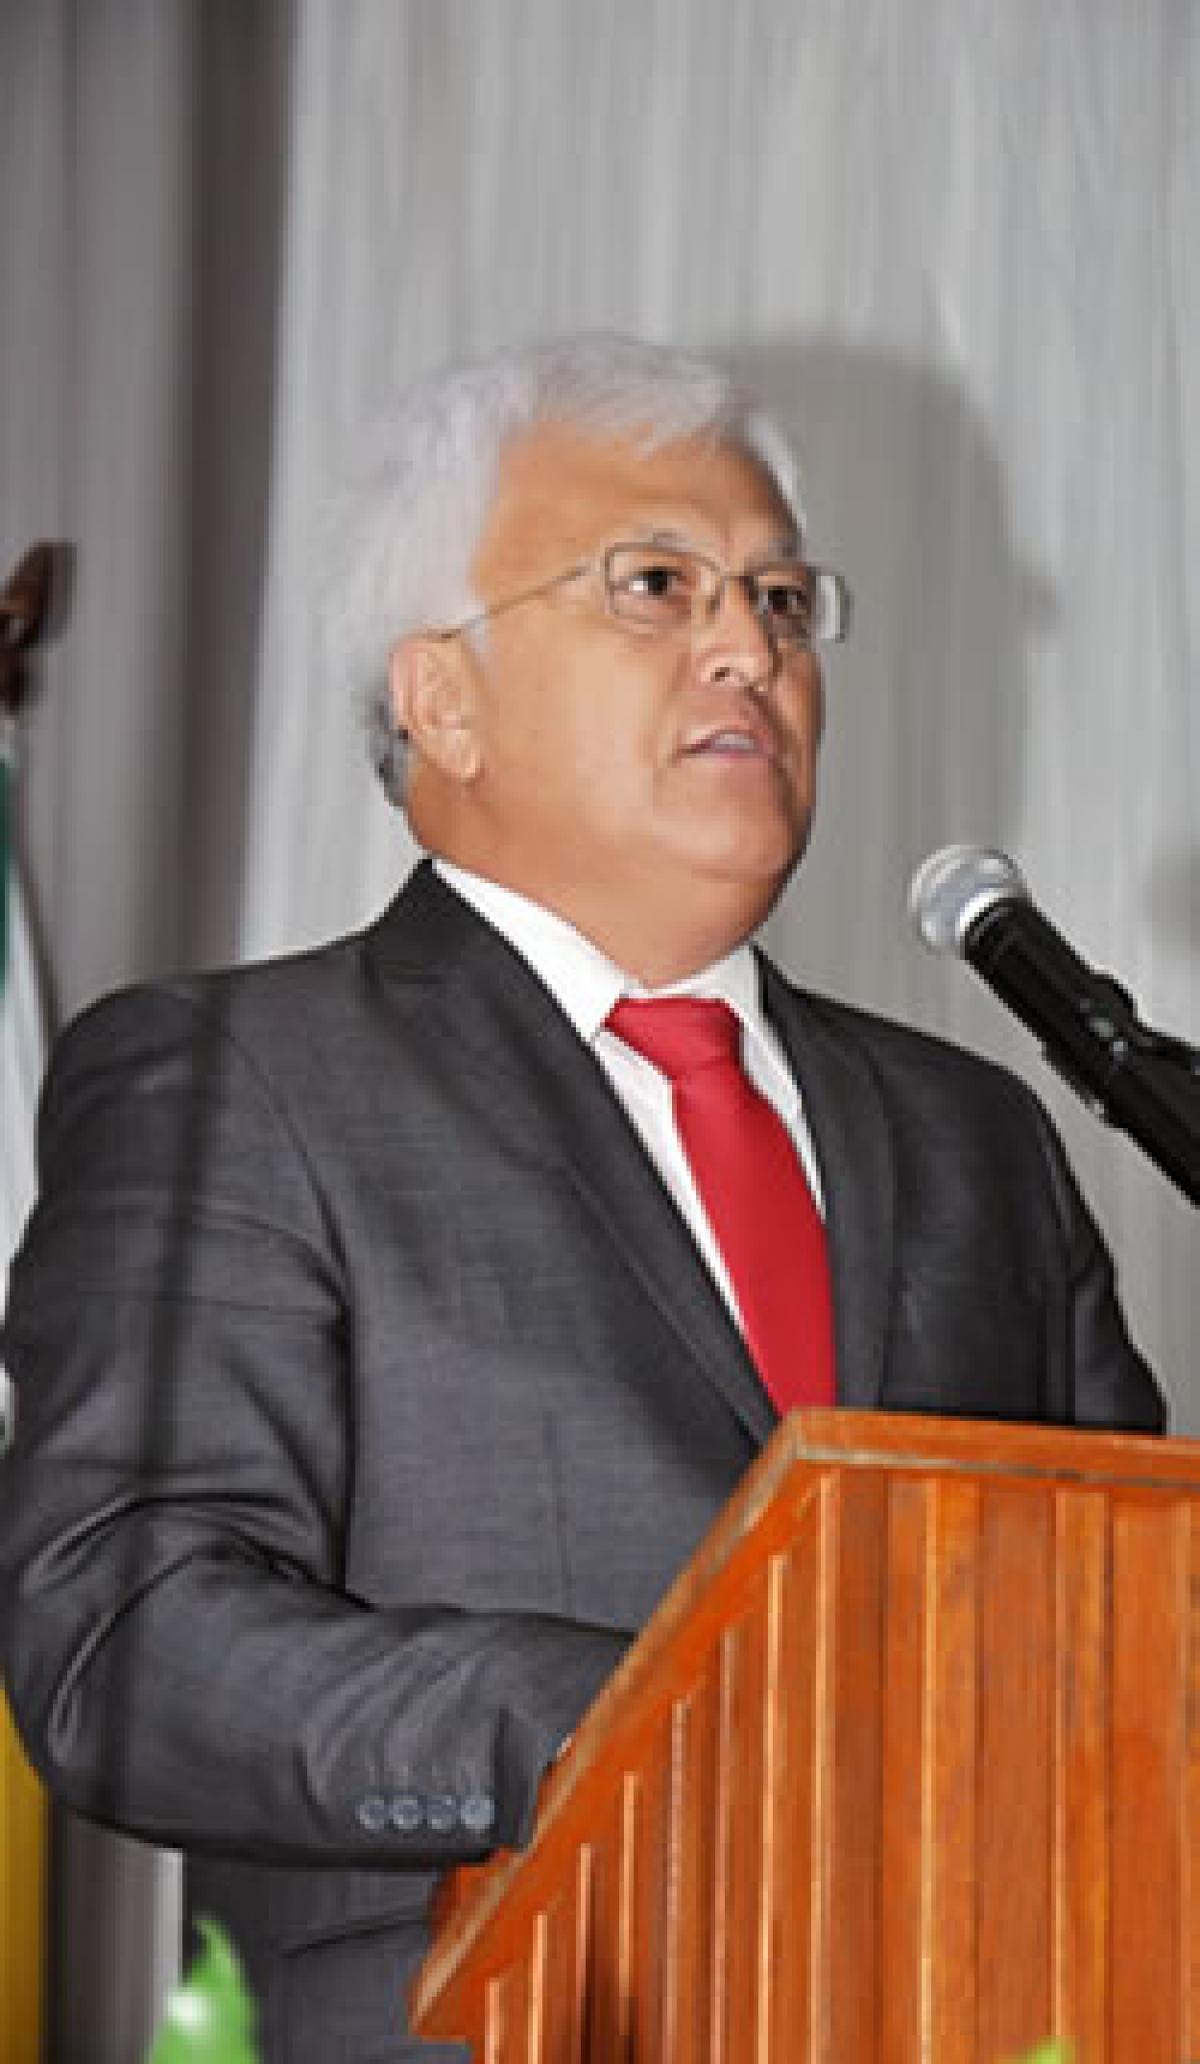 Luiz Divonsir Shimoguiri